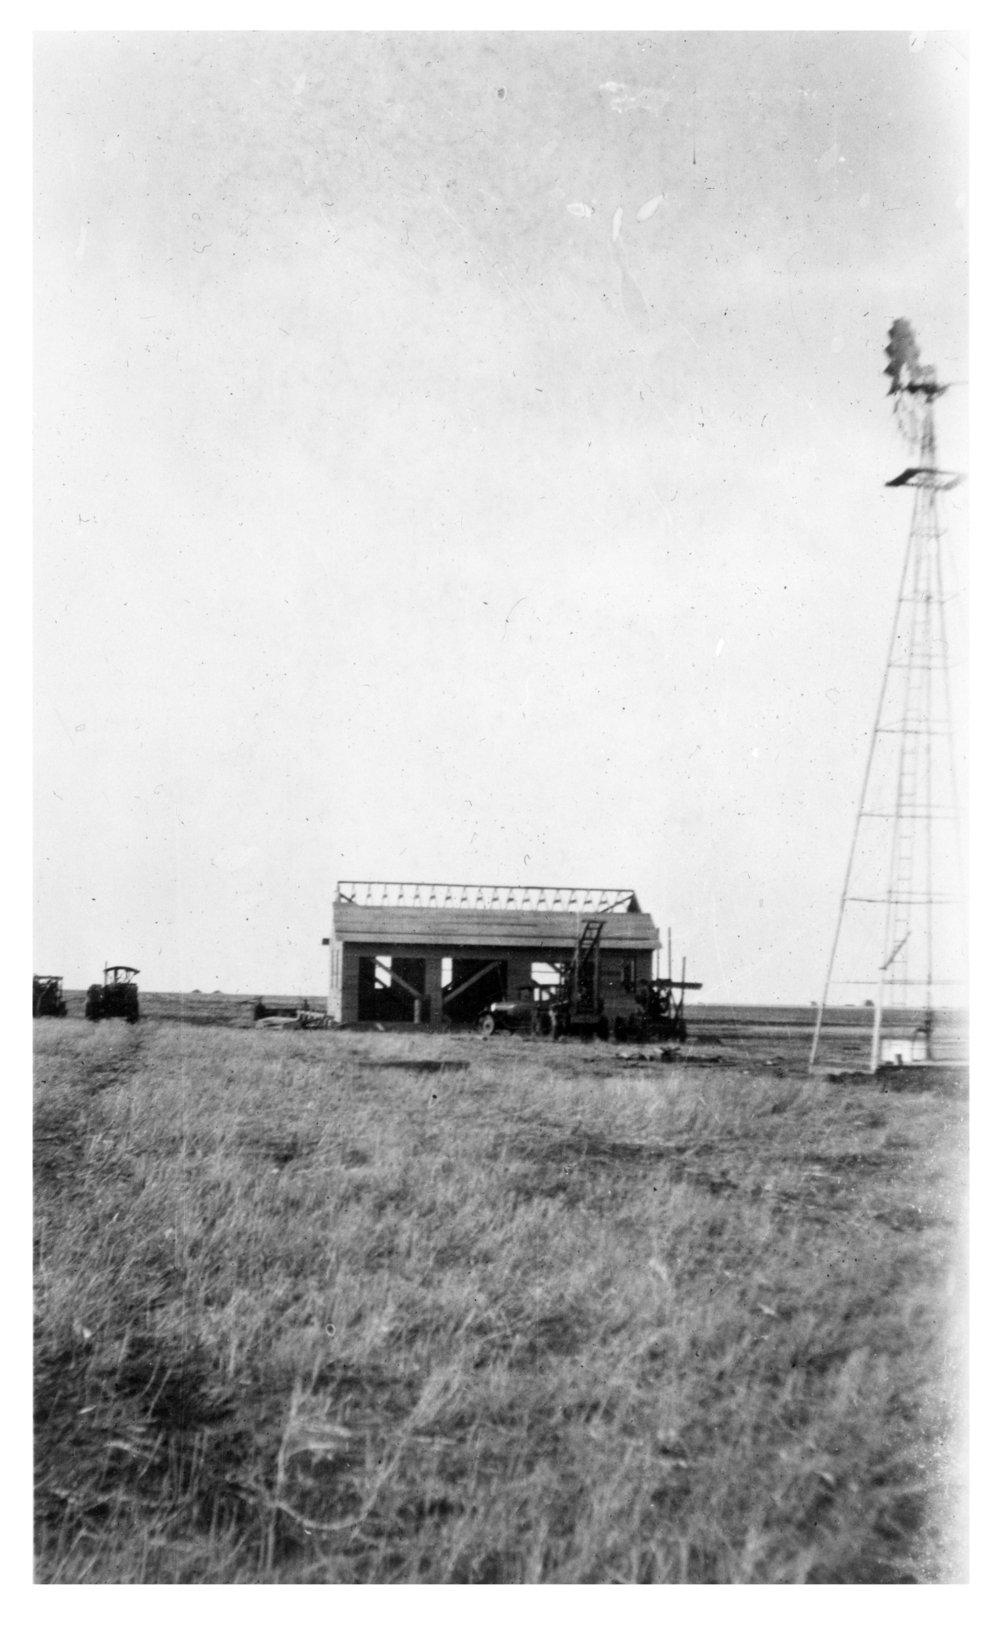 Building a garage on the Frank Cersovsky farm, Thomas County, Kansas - 2